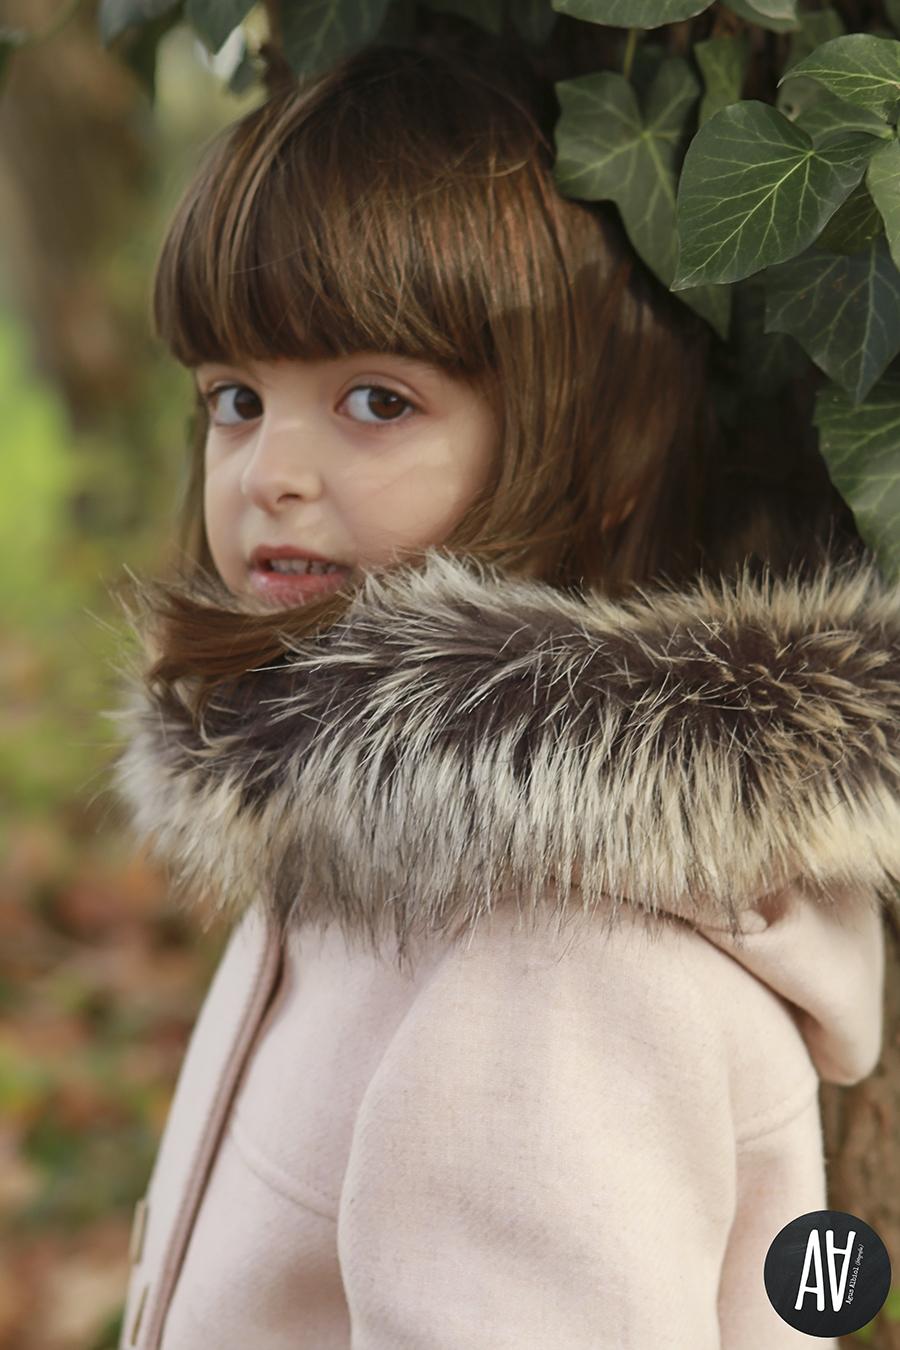 7 - sesion familiar y niños barcelona - sesiones fotografia exterior - agus albiol fotografia